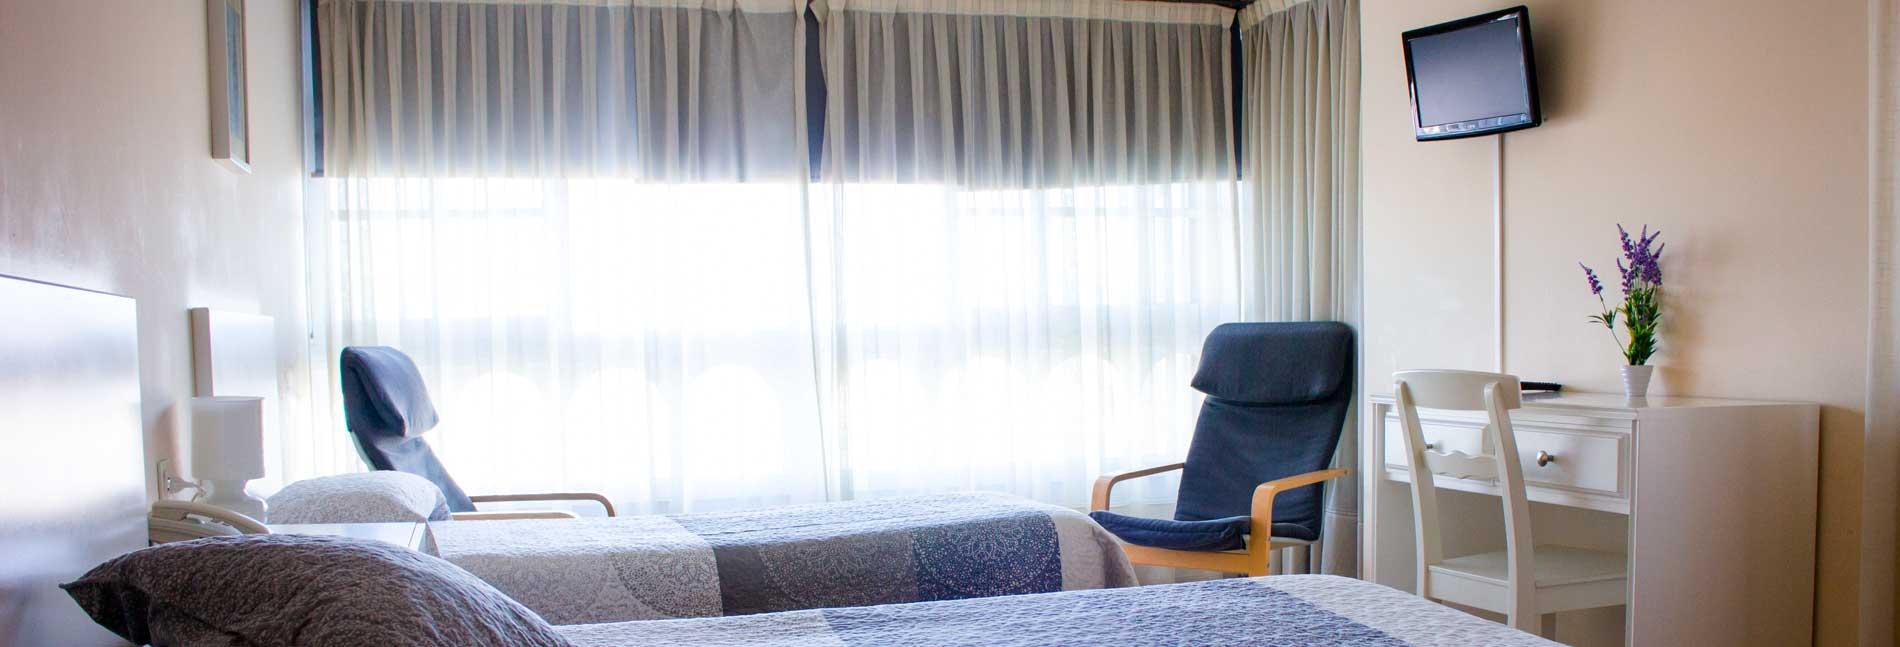 Hotel-Cais-Baiona-habitaciones